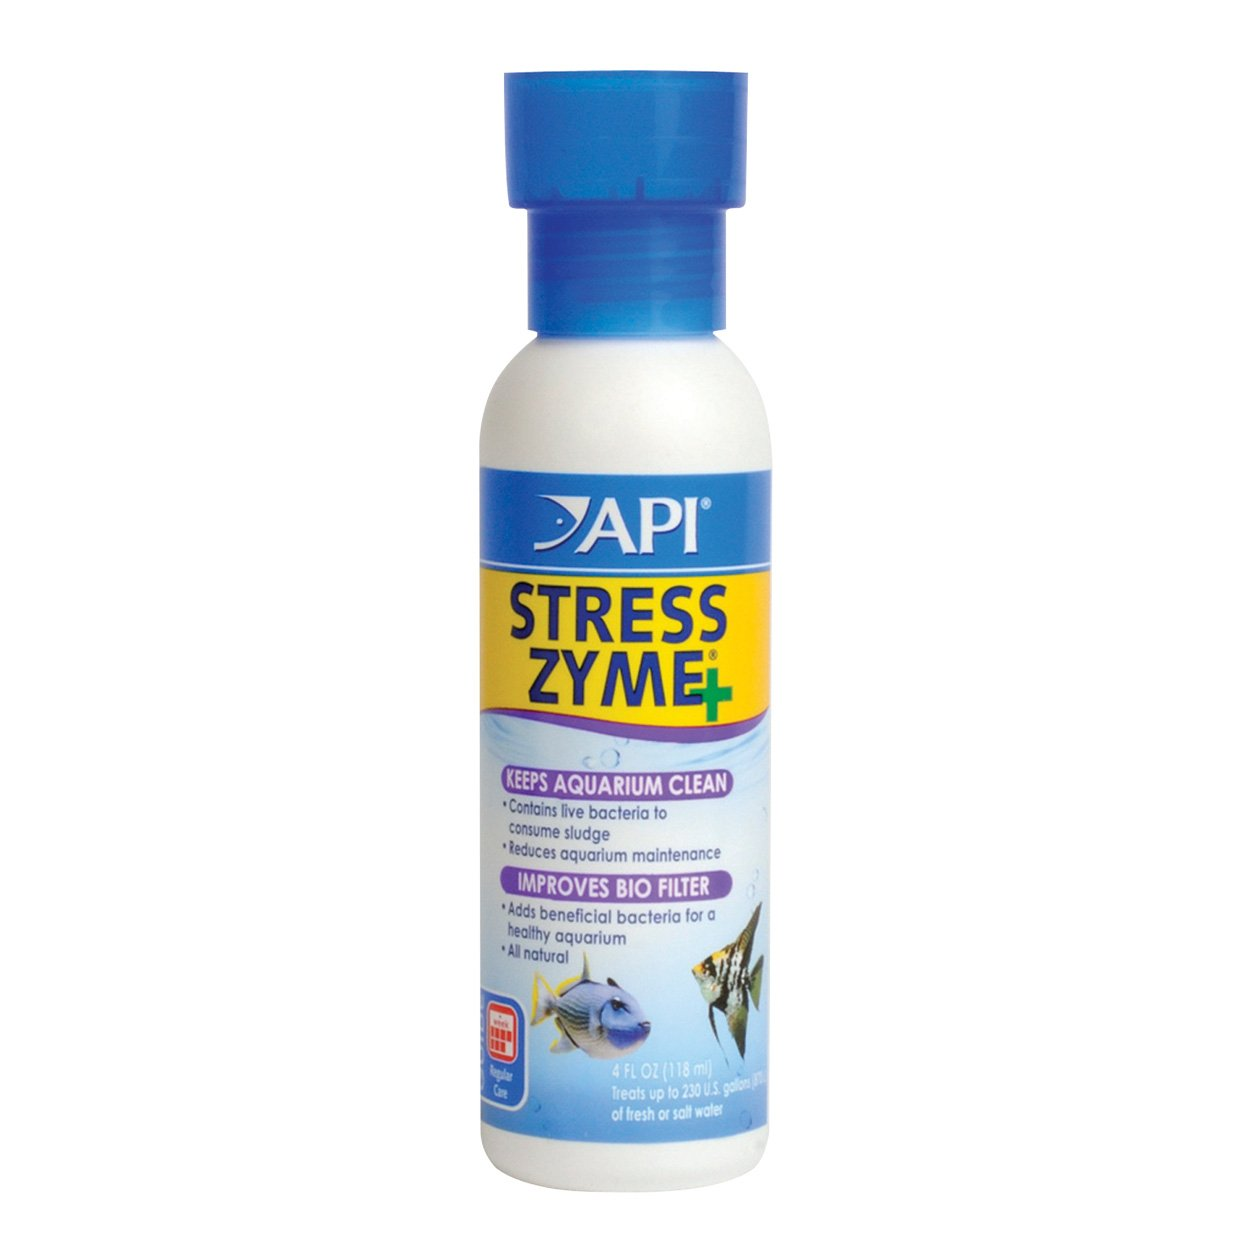 API 2343 Stress Zyme+ Thermometers